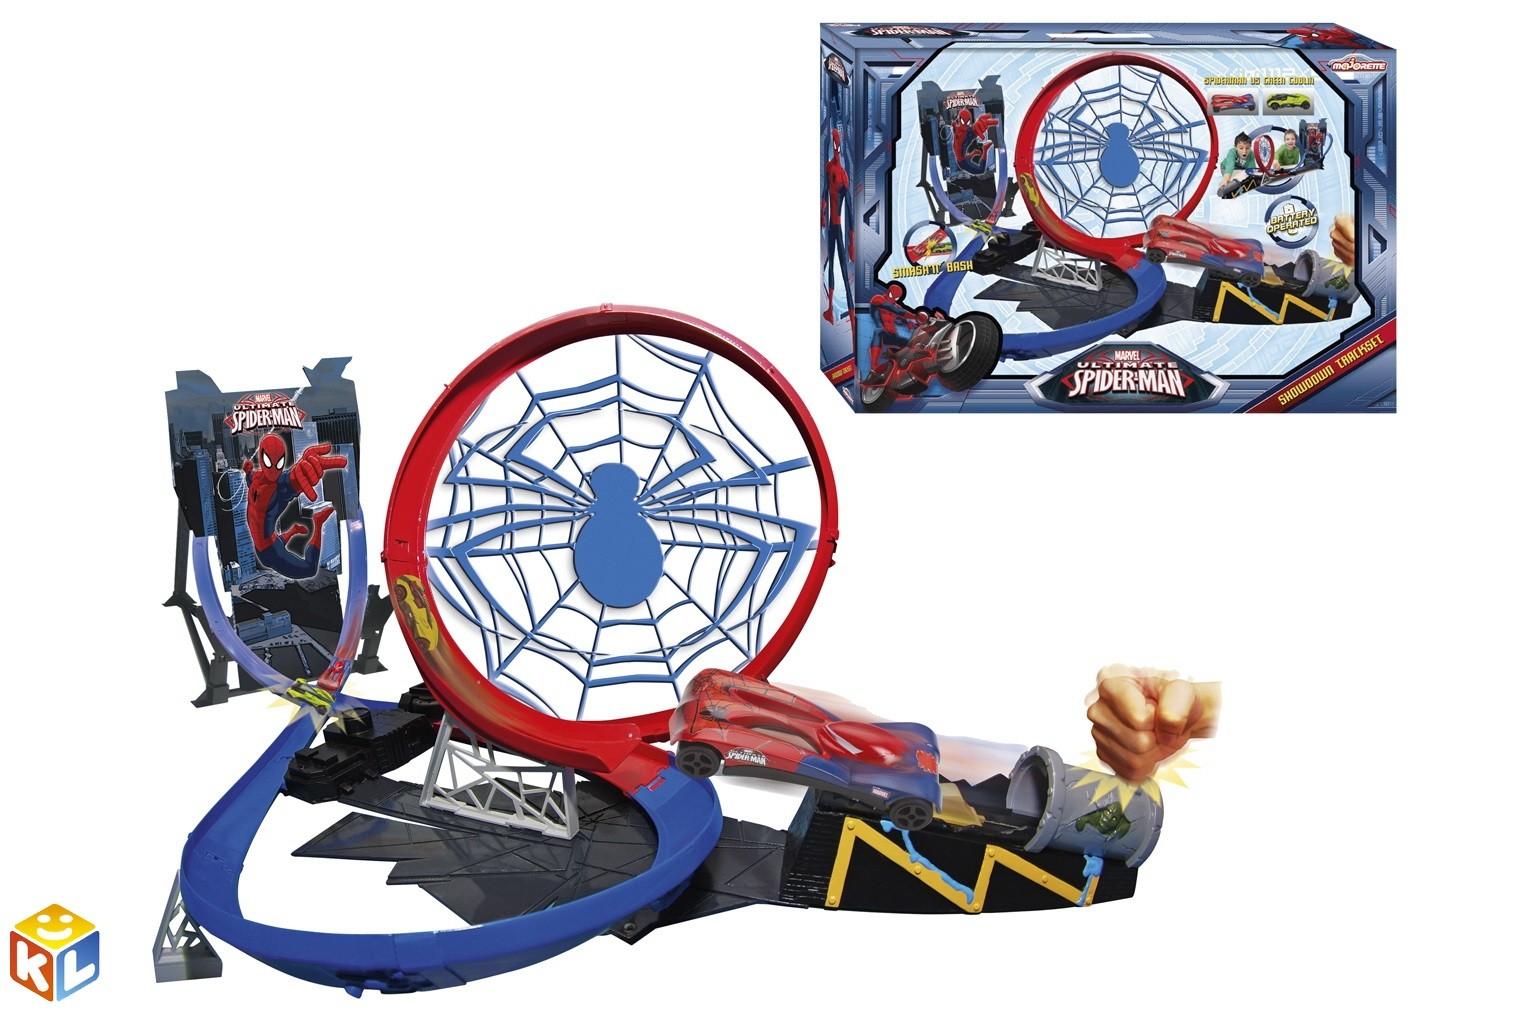 Автотрек Человек паук. Мертвая петля, Majorette